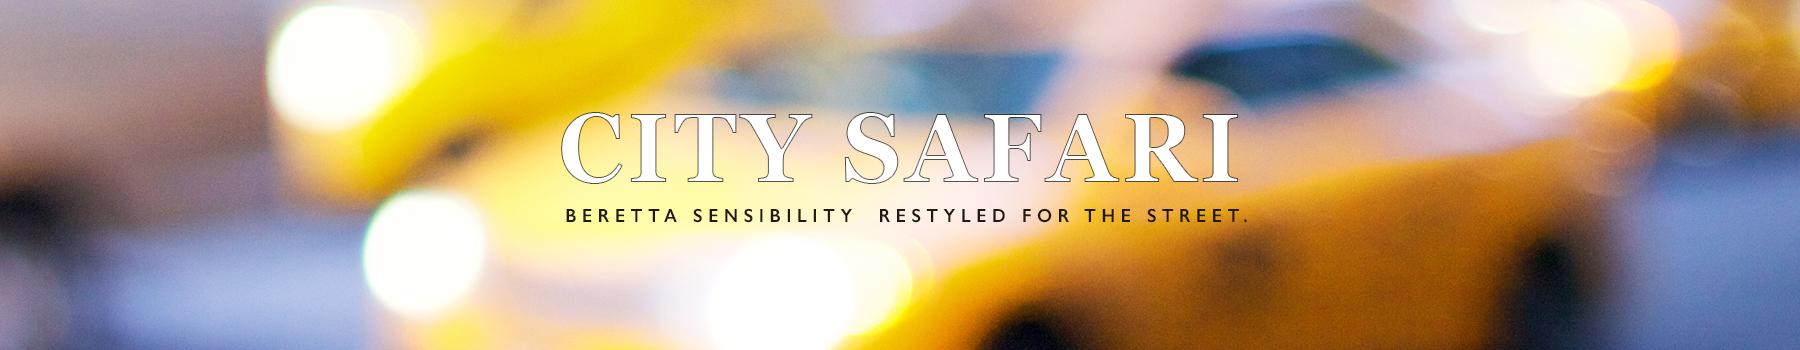 City Safari